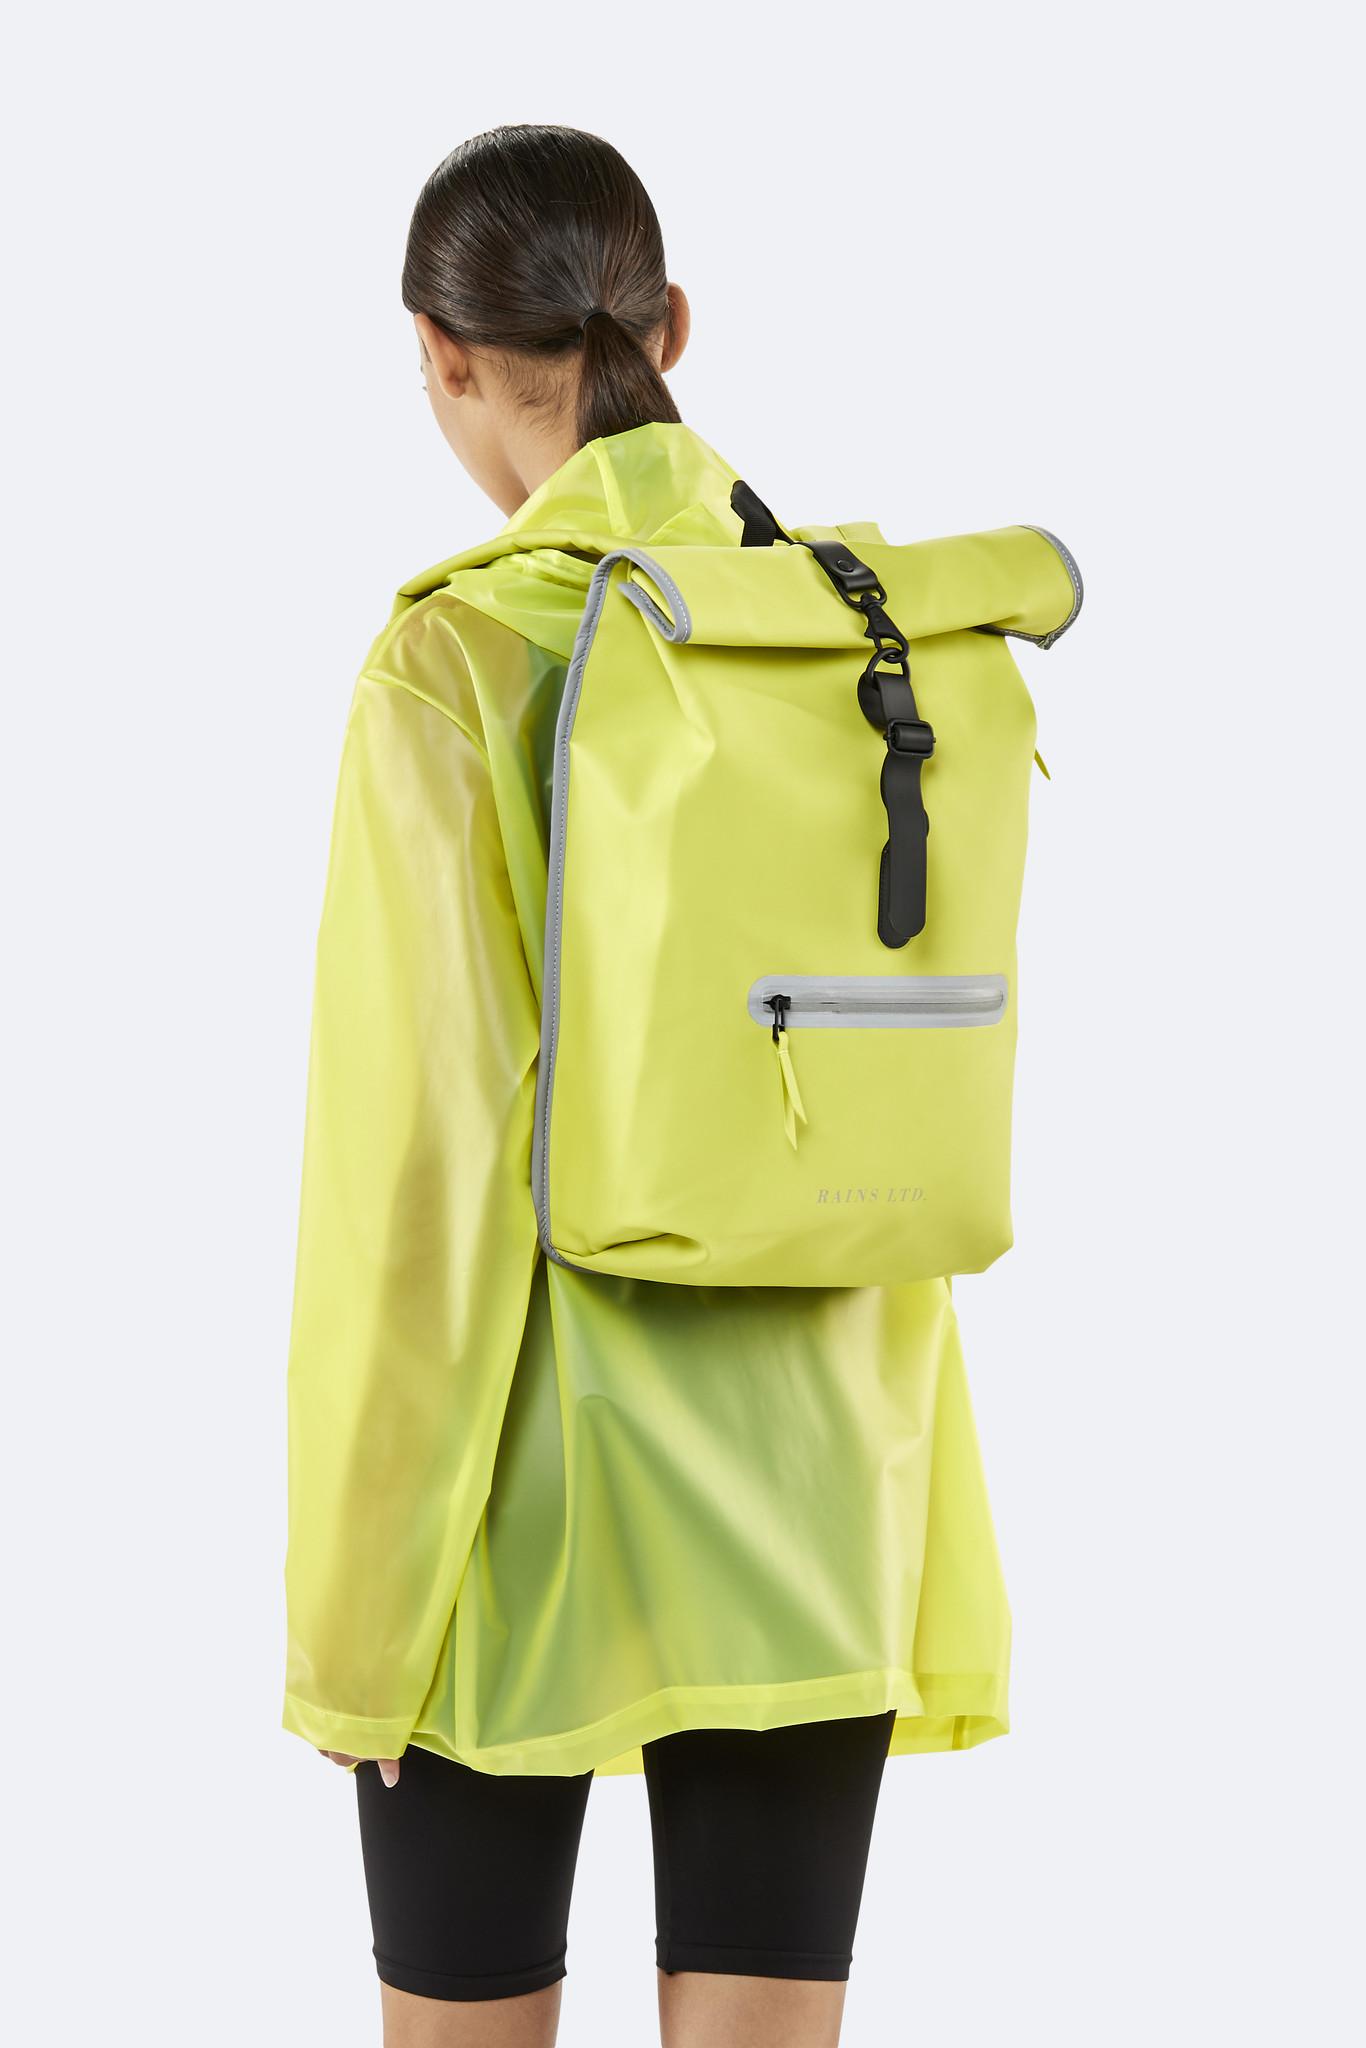 pretty nice where to buy ever popular Rains Roll-top Rucksack 1707 LTD Neon Yellow